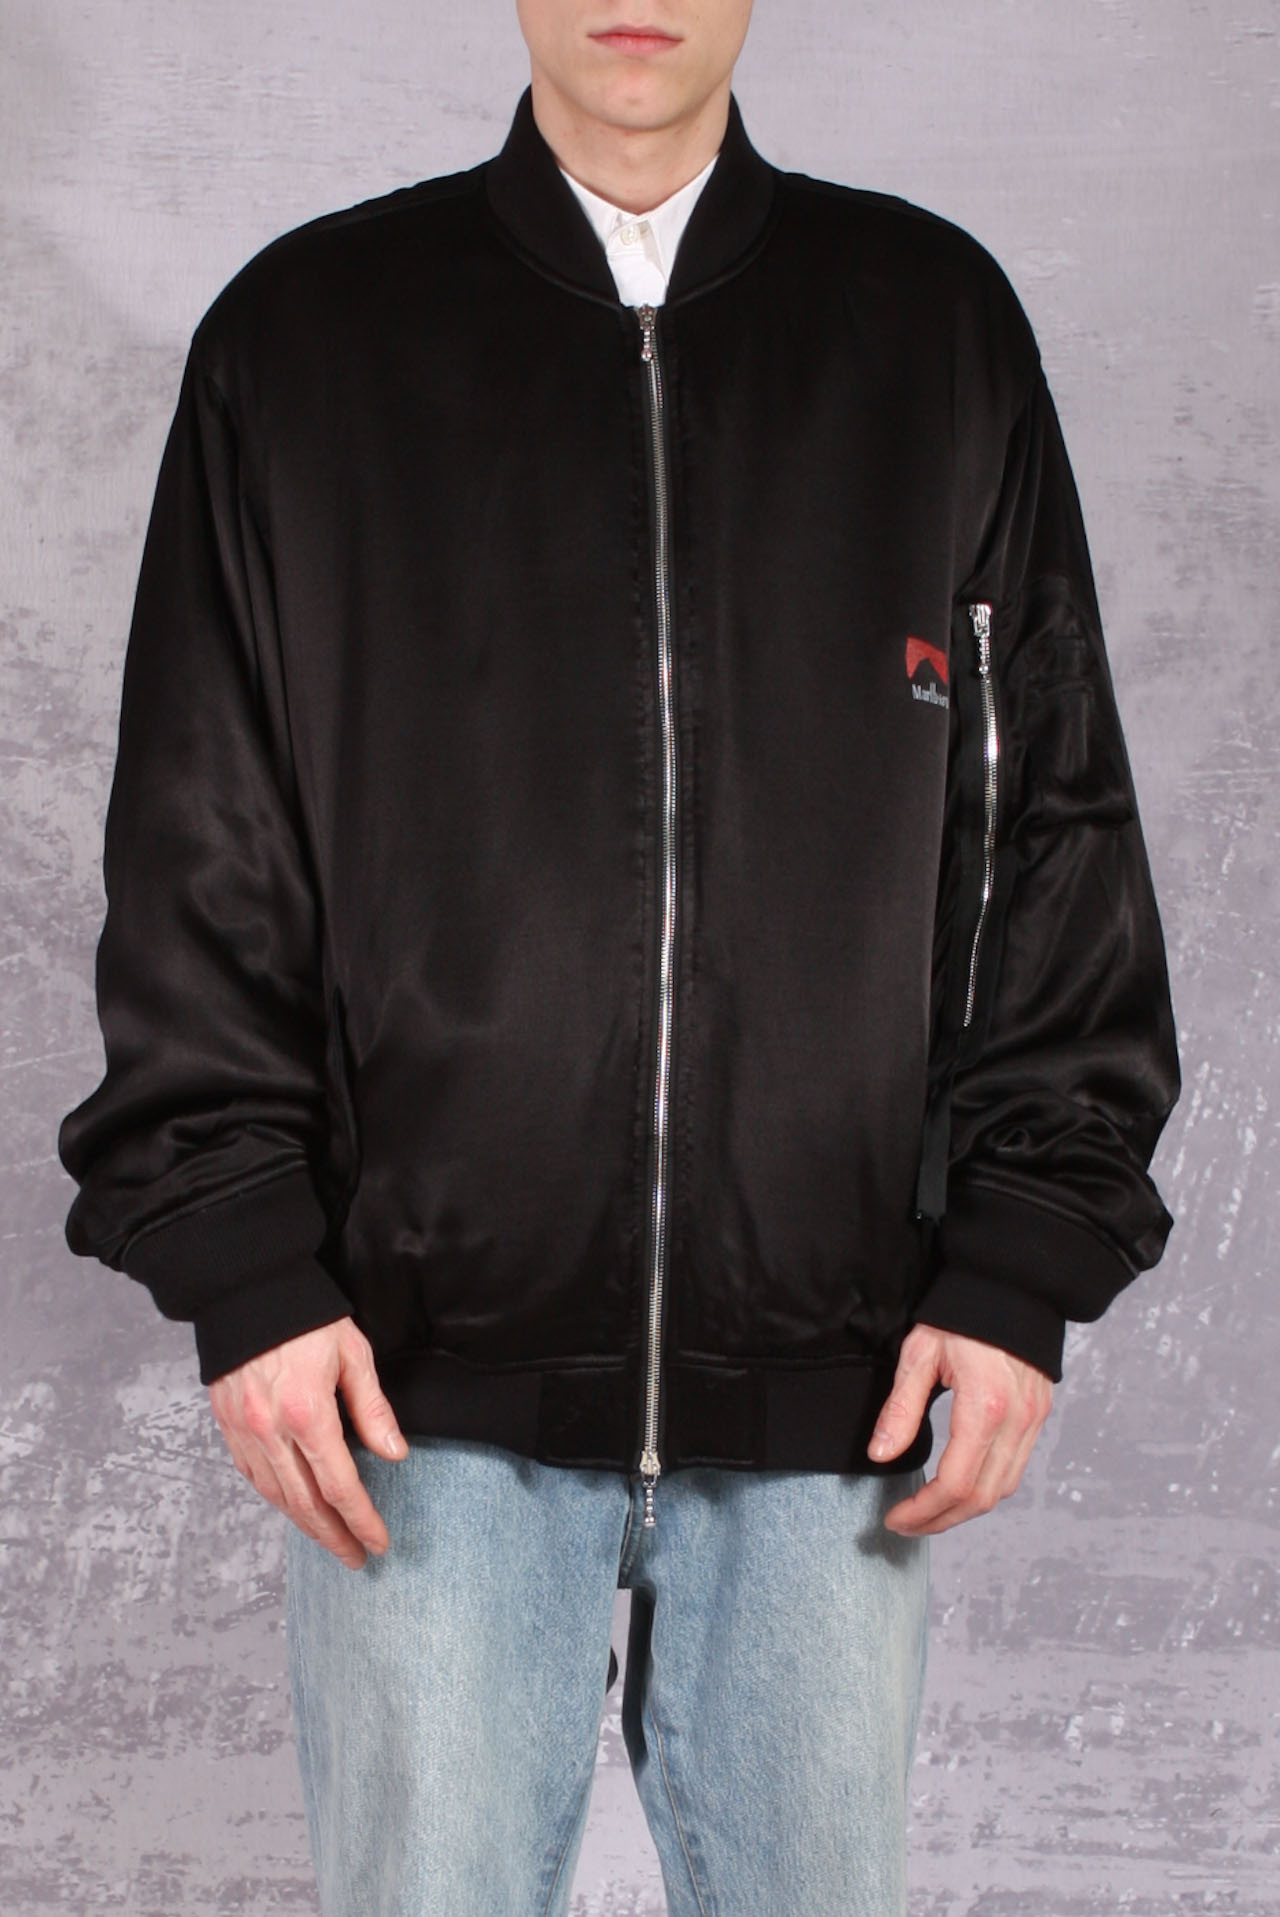 Sagittaire A jacket